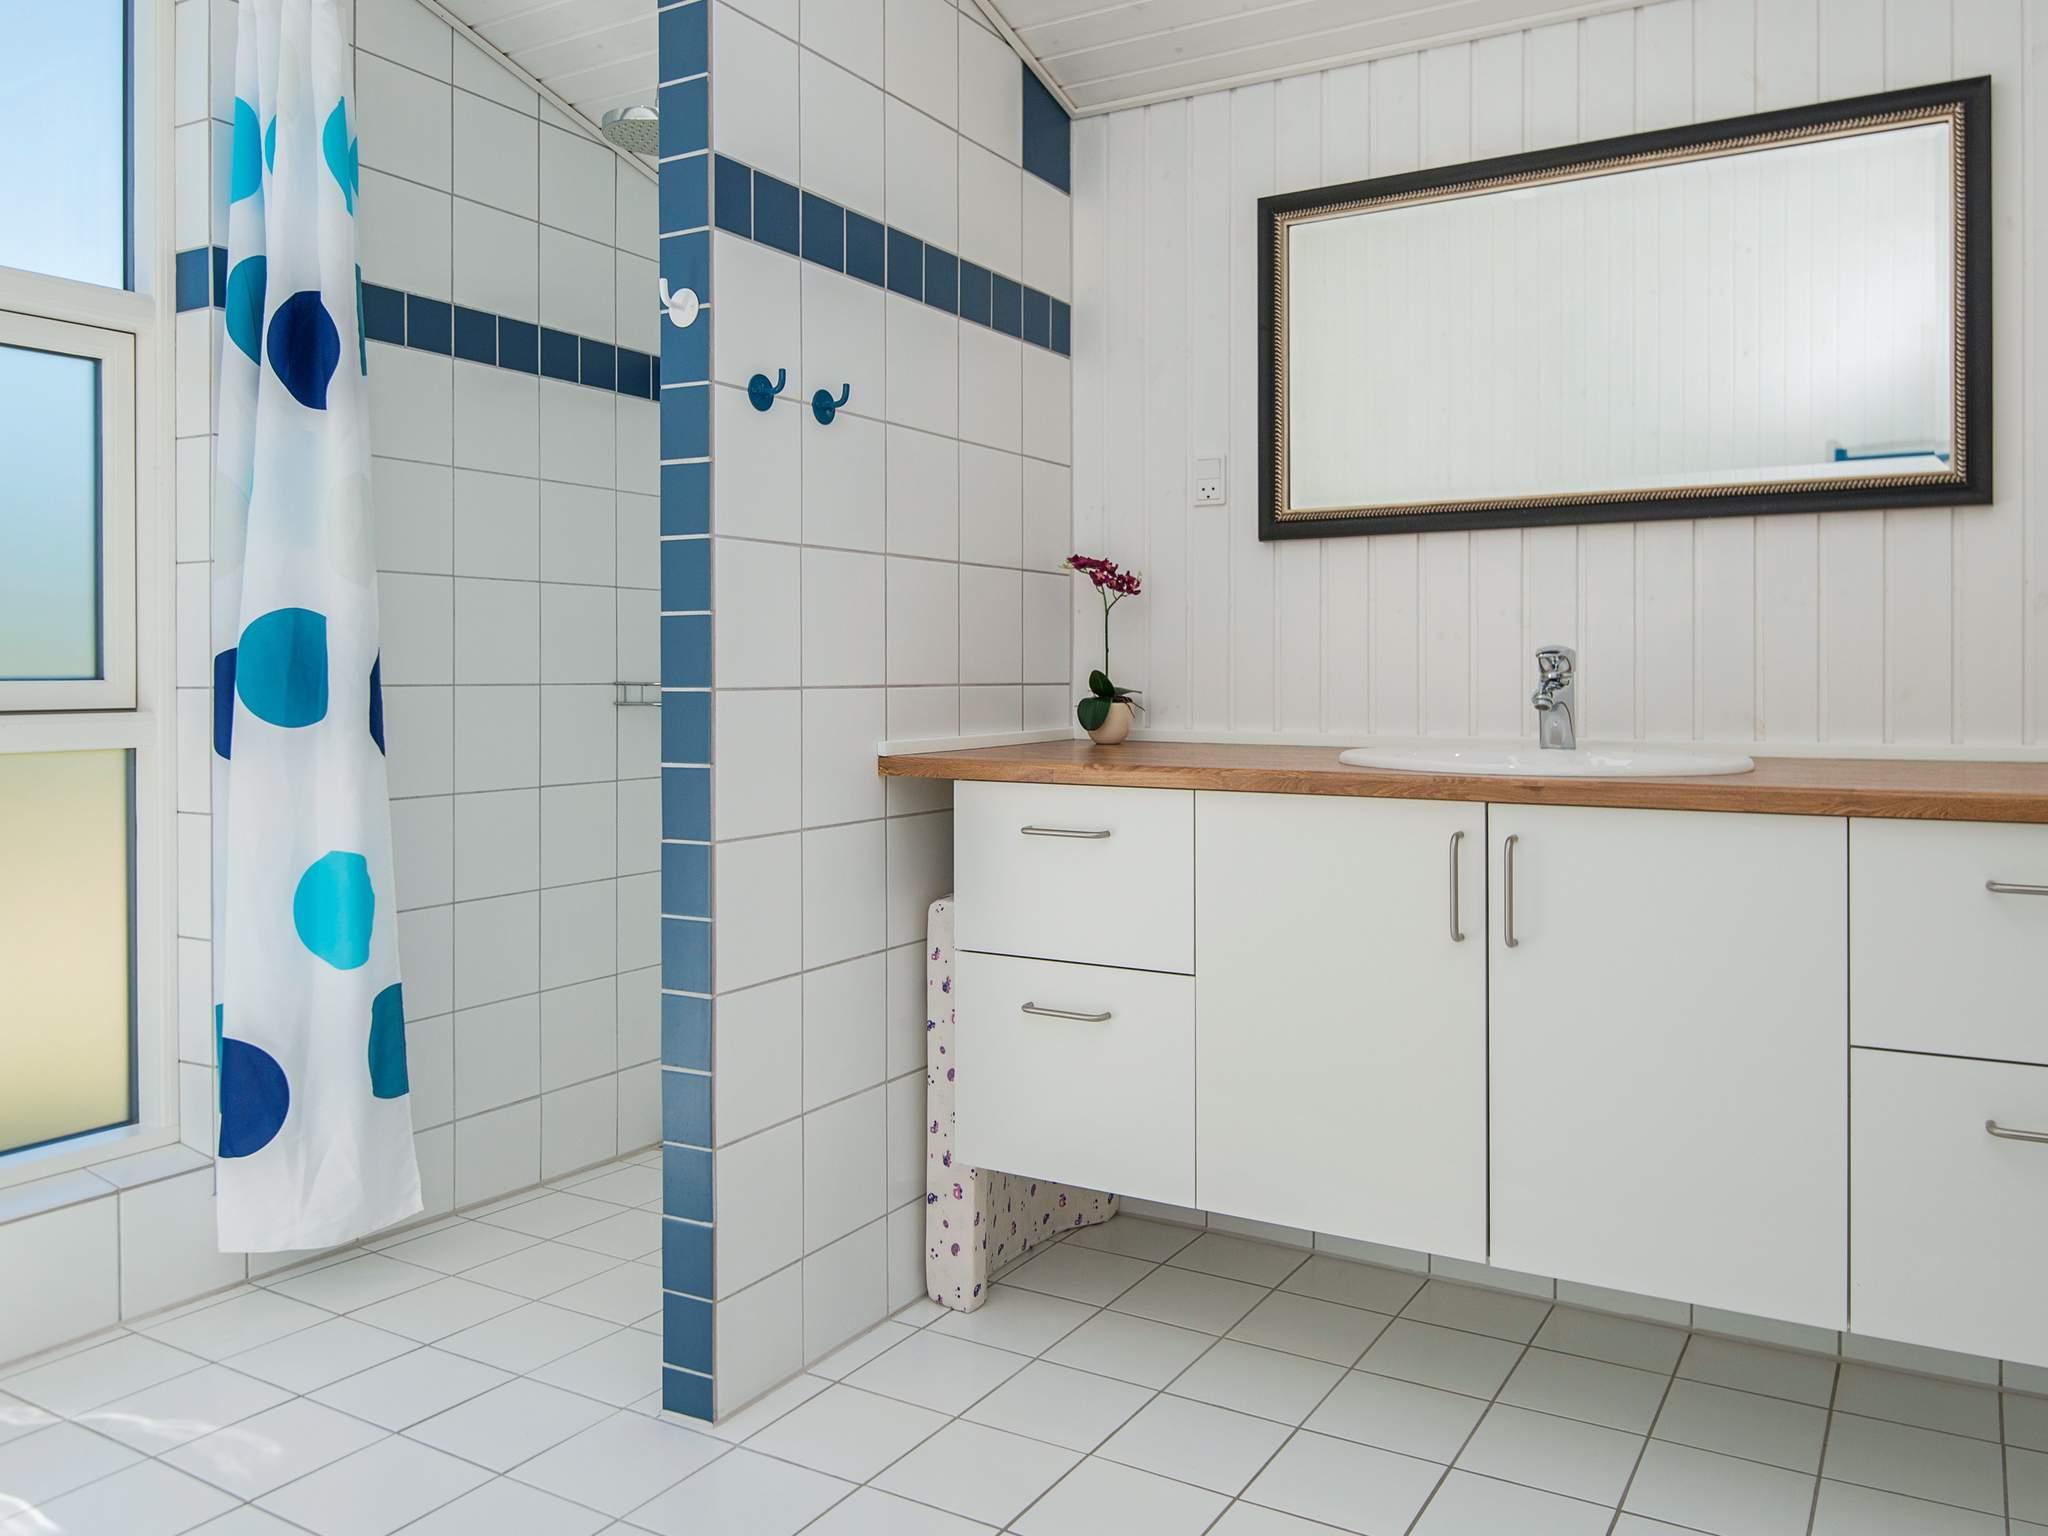 Maison de vacances Helgenæs (978615), Knebel, , Jutland Est, Danemark, image 10